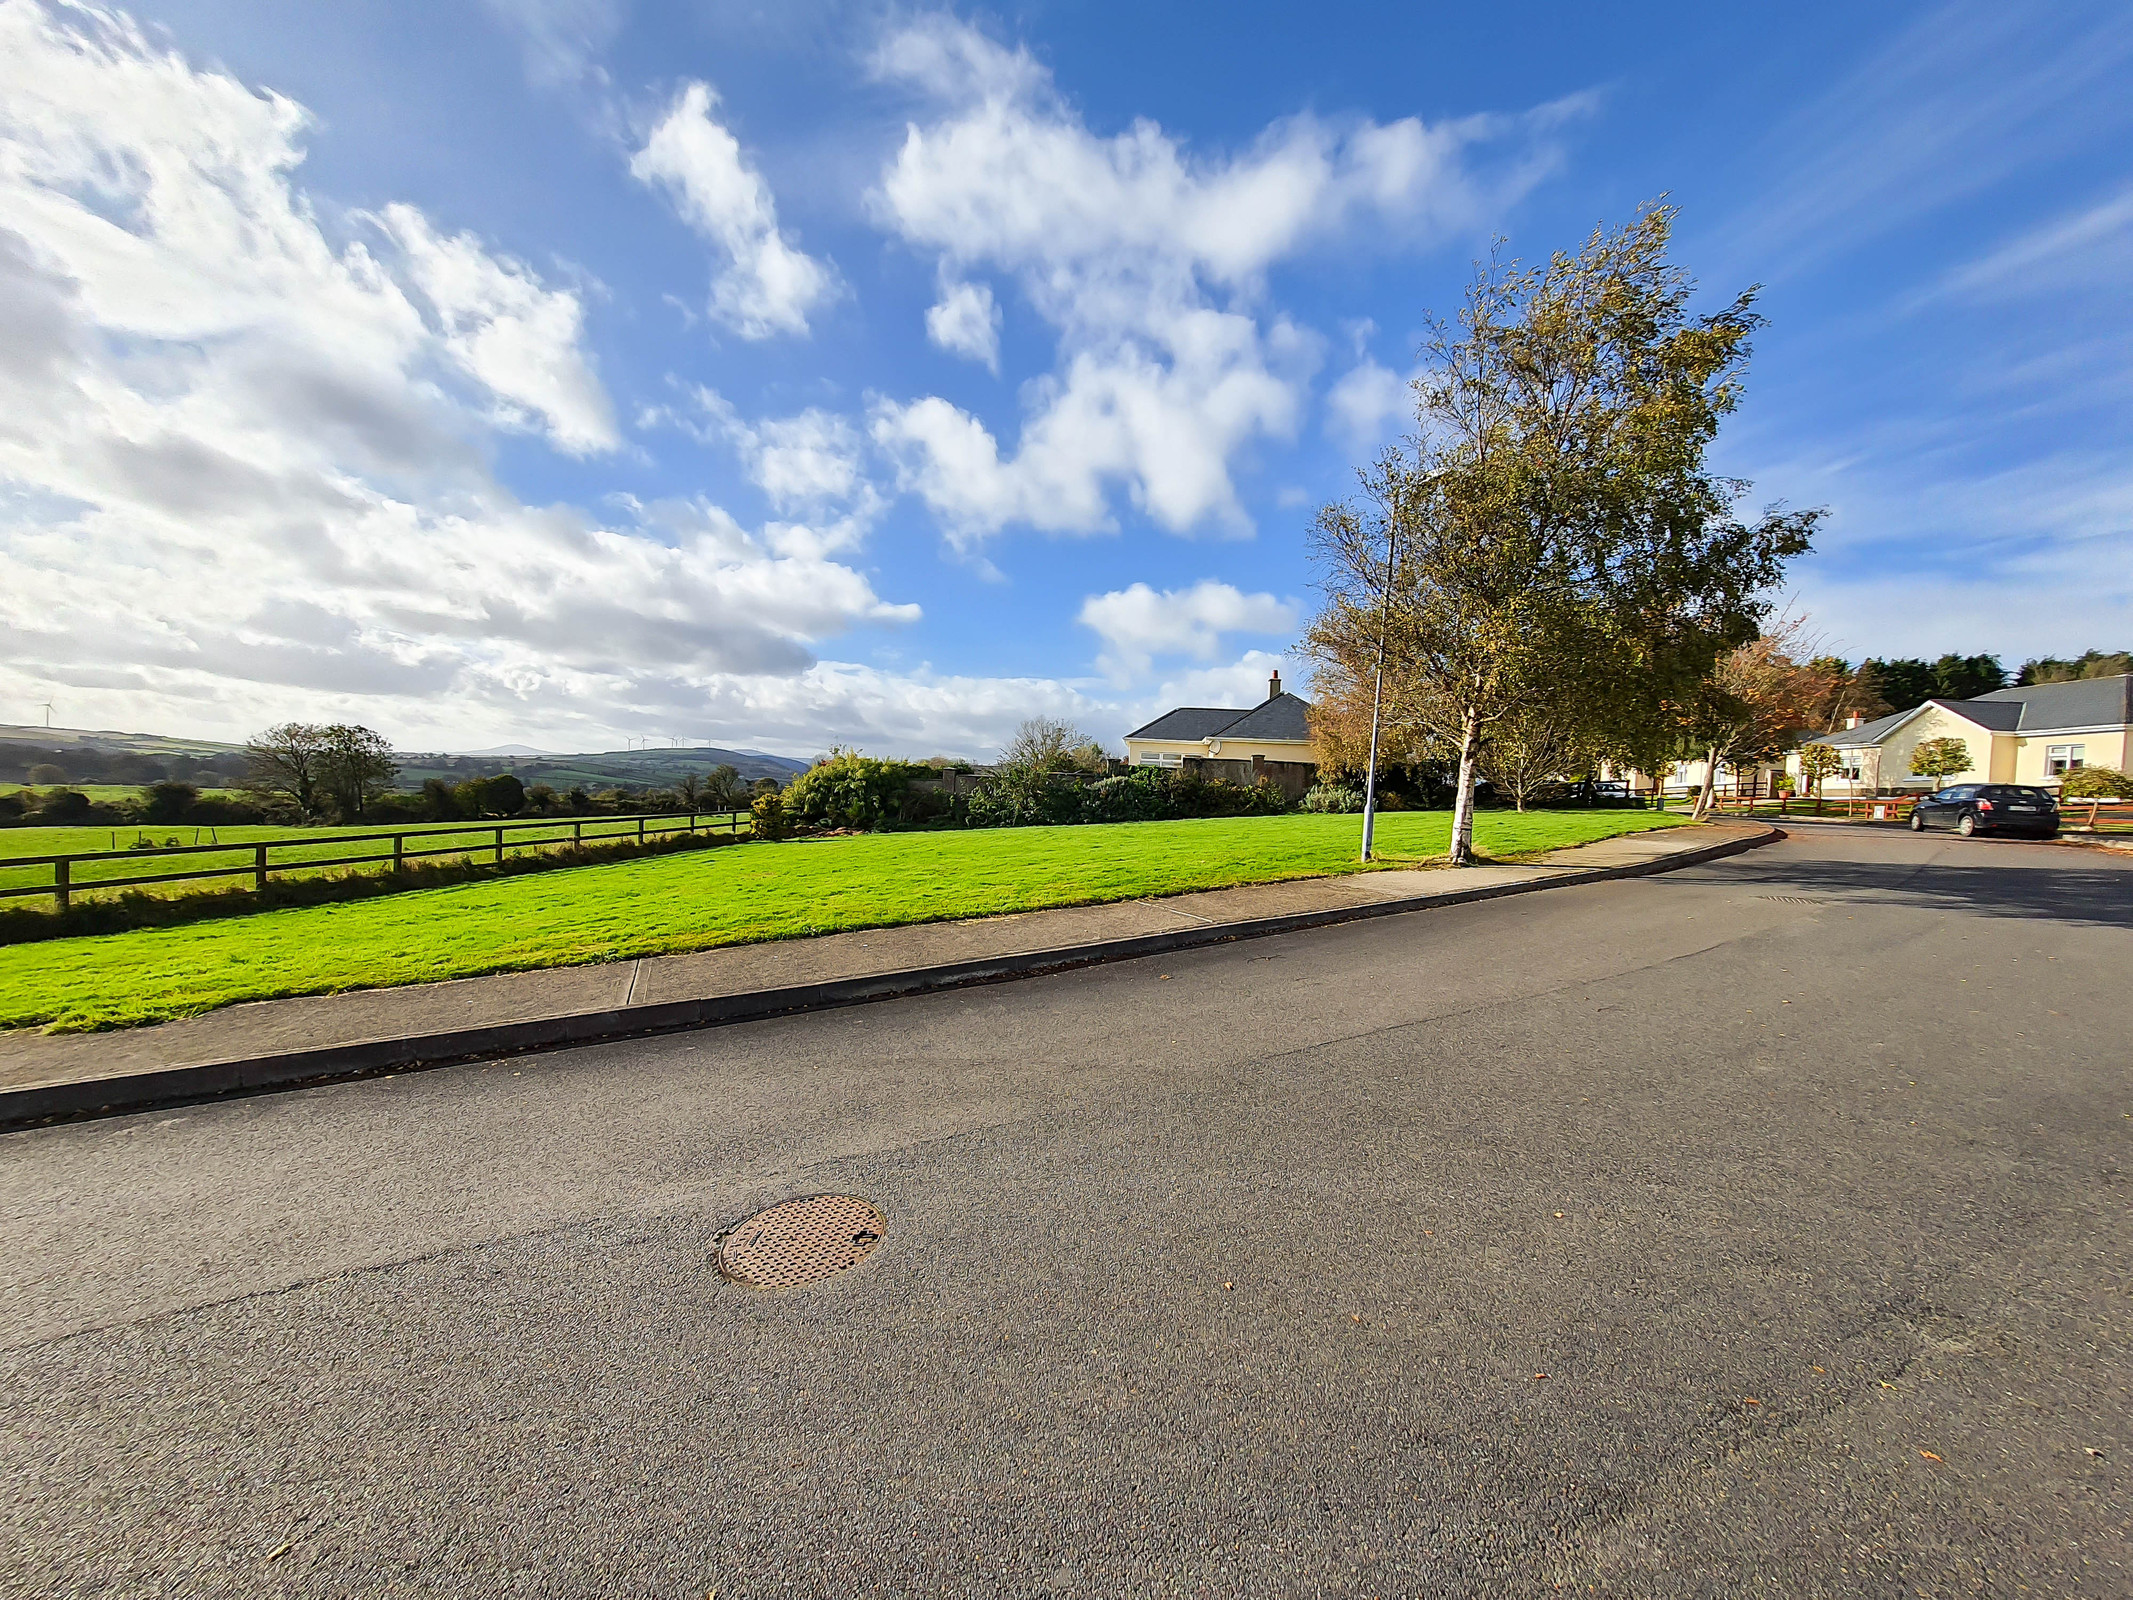 No 1 Glenview, Gorey Road, Carnew, Co. Wicklow